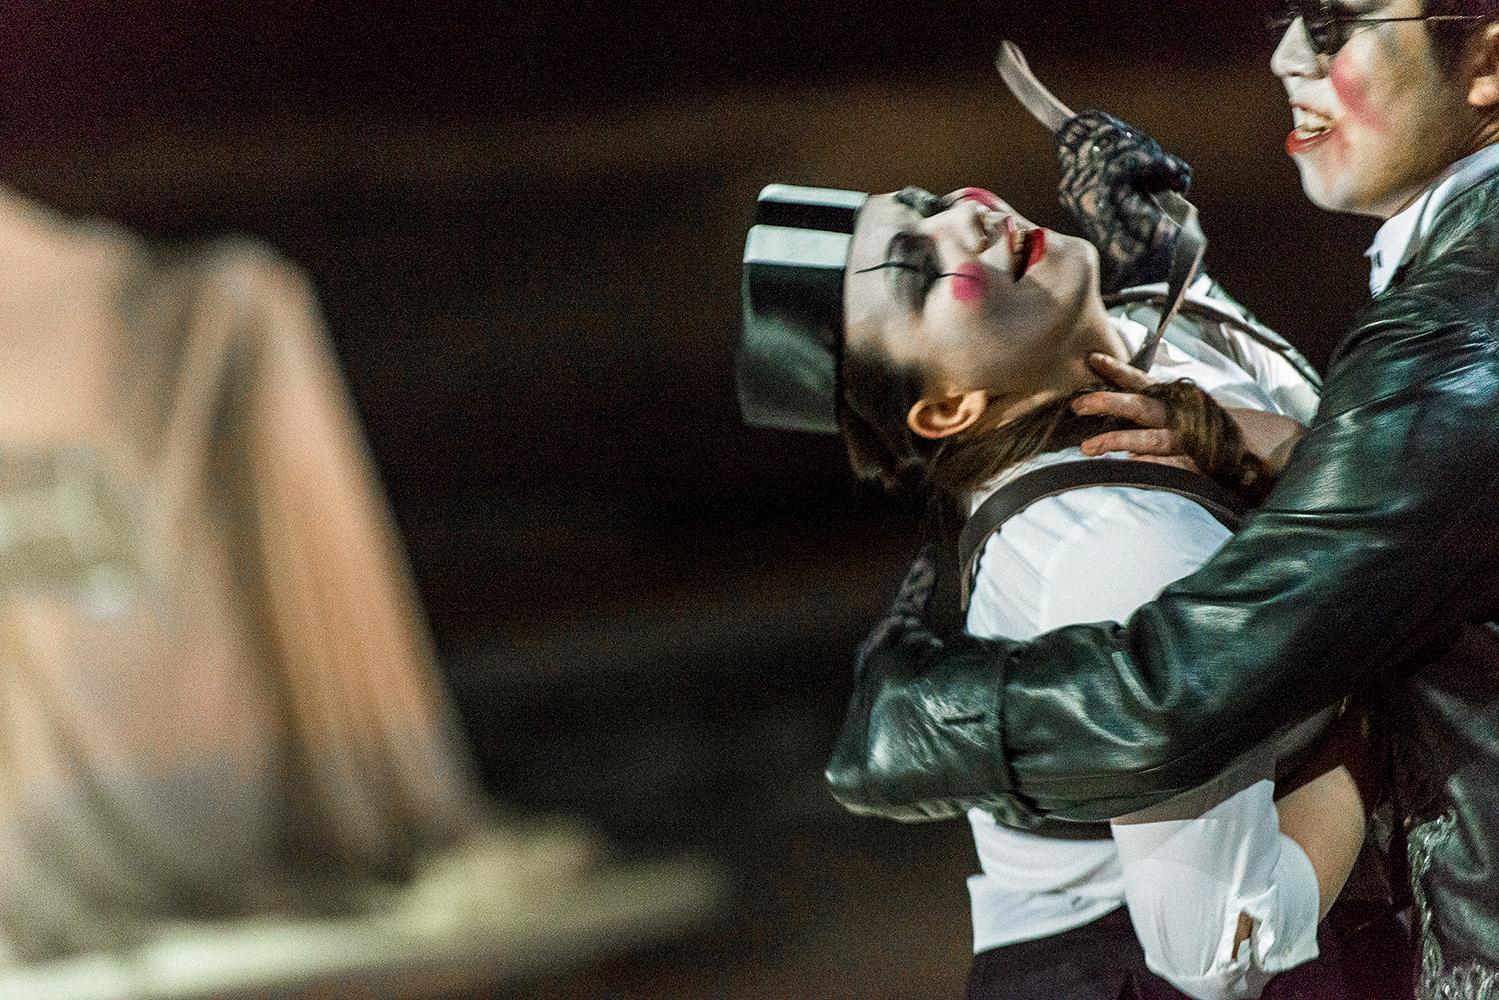 """The Rape of Lucretia"", B.Britten, Oper der Stadt Köln, Inszenierung: Kai-Anne Schumacher"